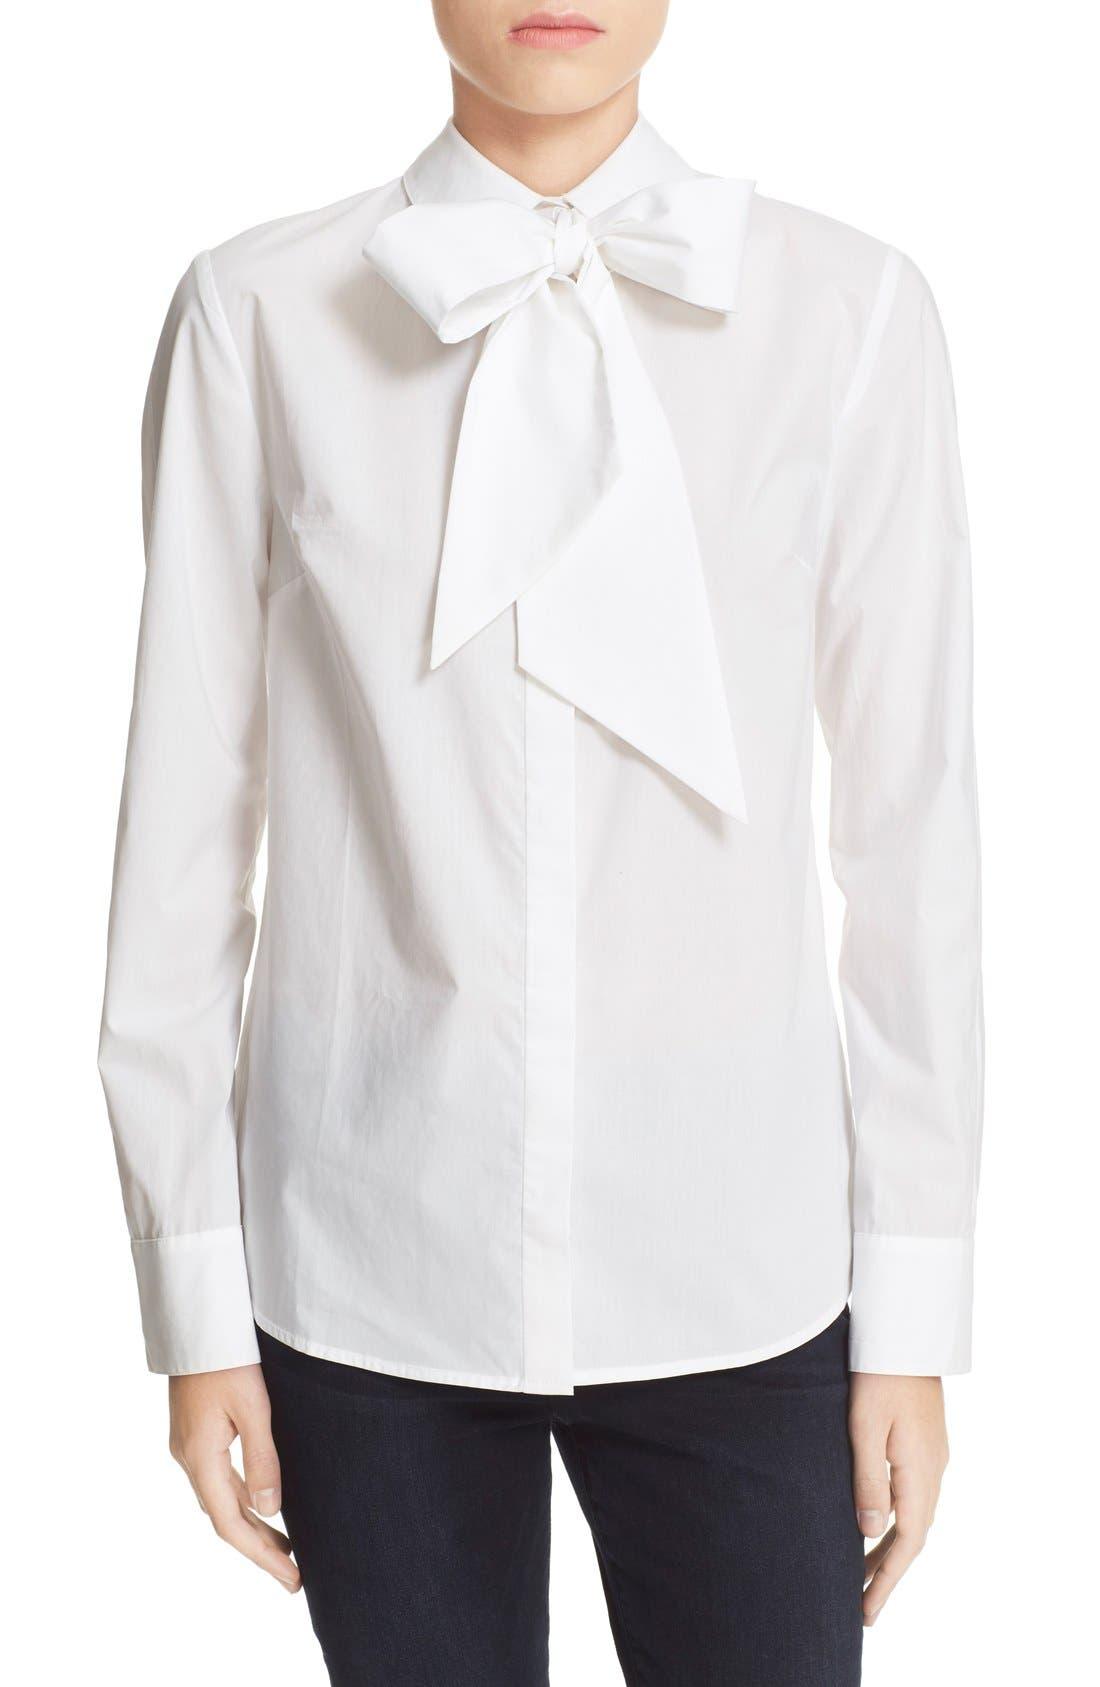 Alternate Image 1 Selected - FRAME 'Le Bowtie' Removable Tie Cotton Poplin Blouse